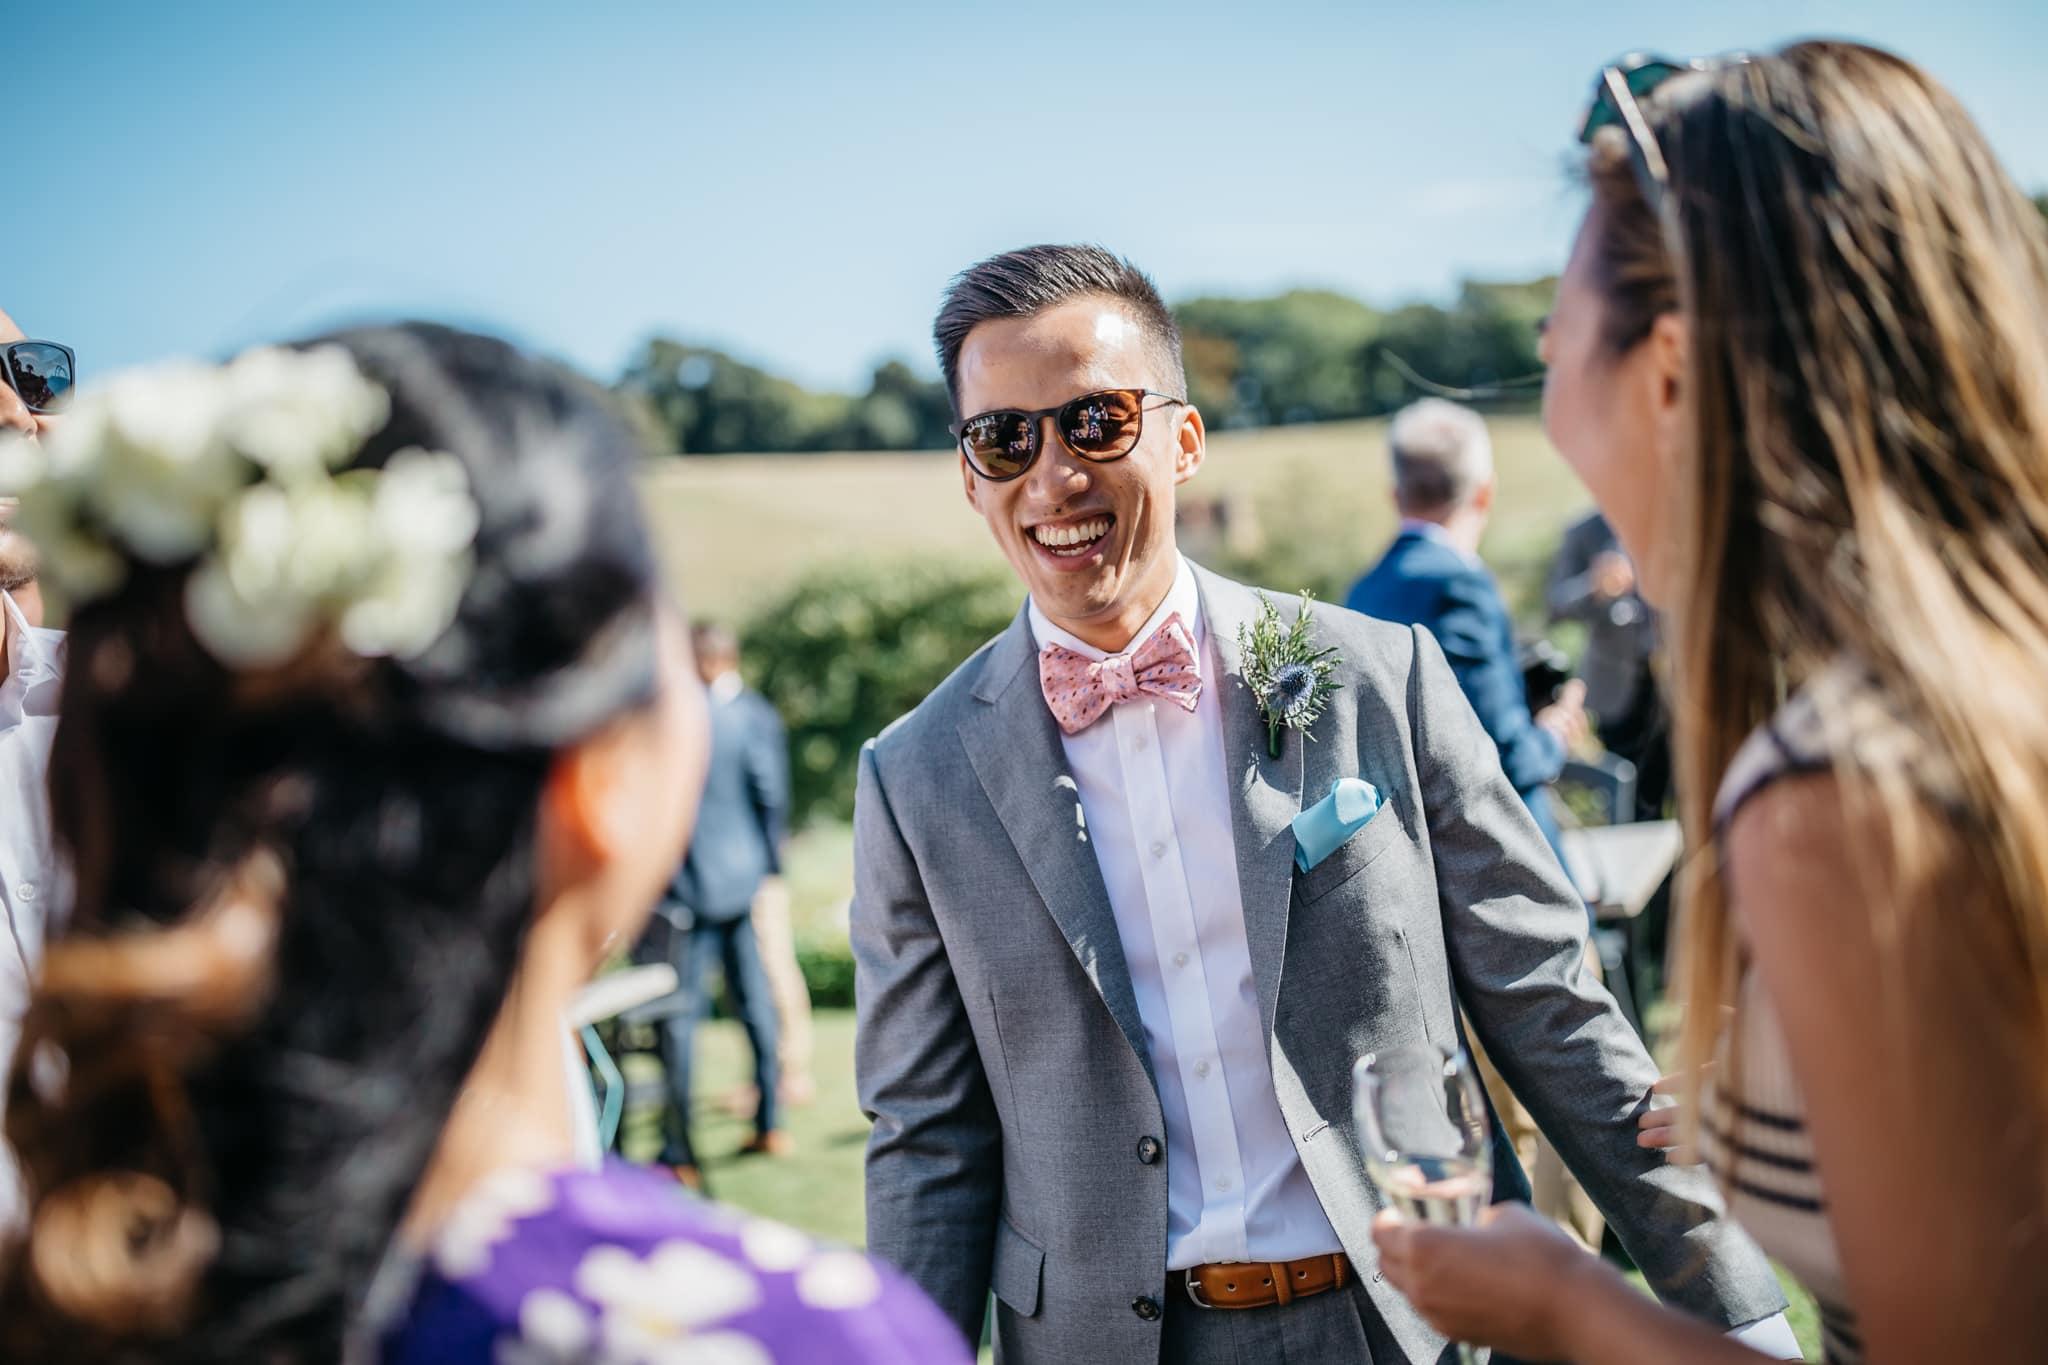 Groom at wedding laughing